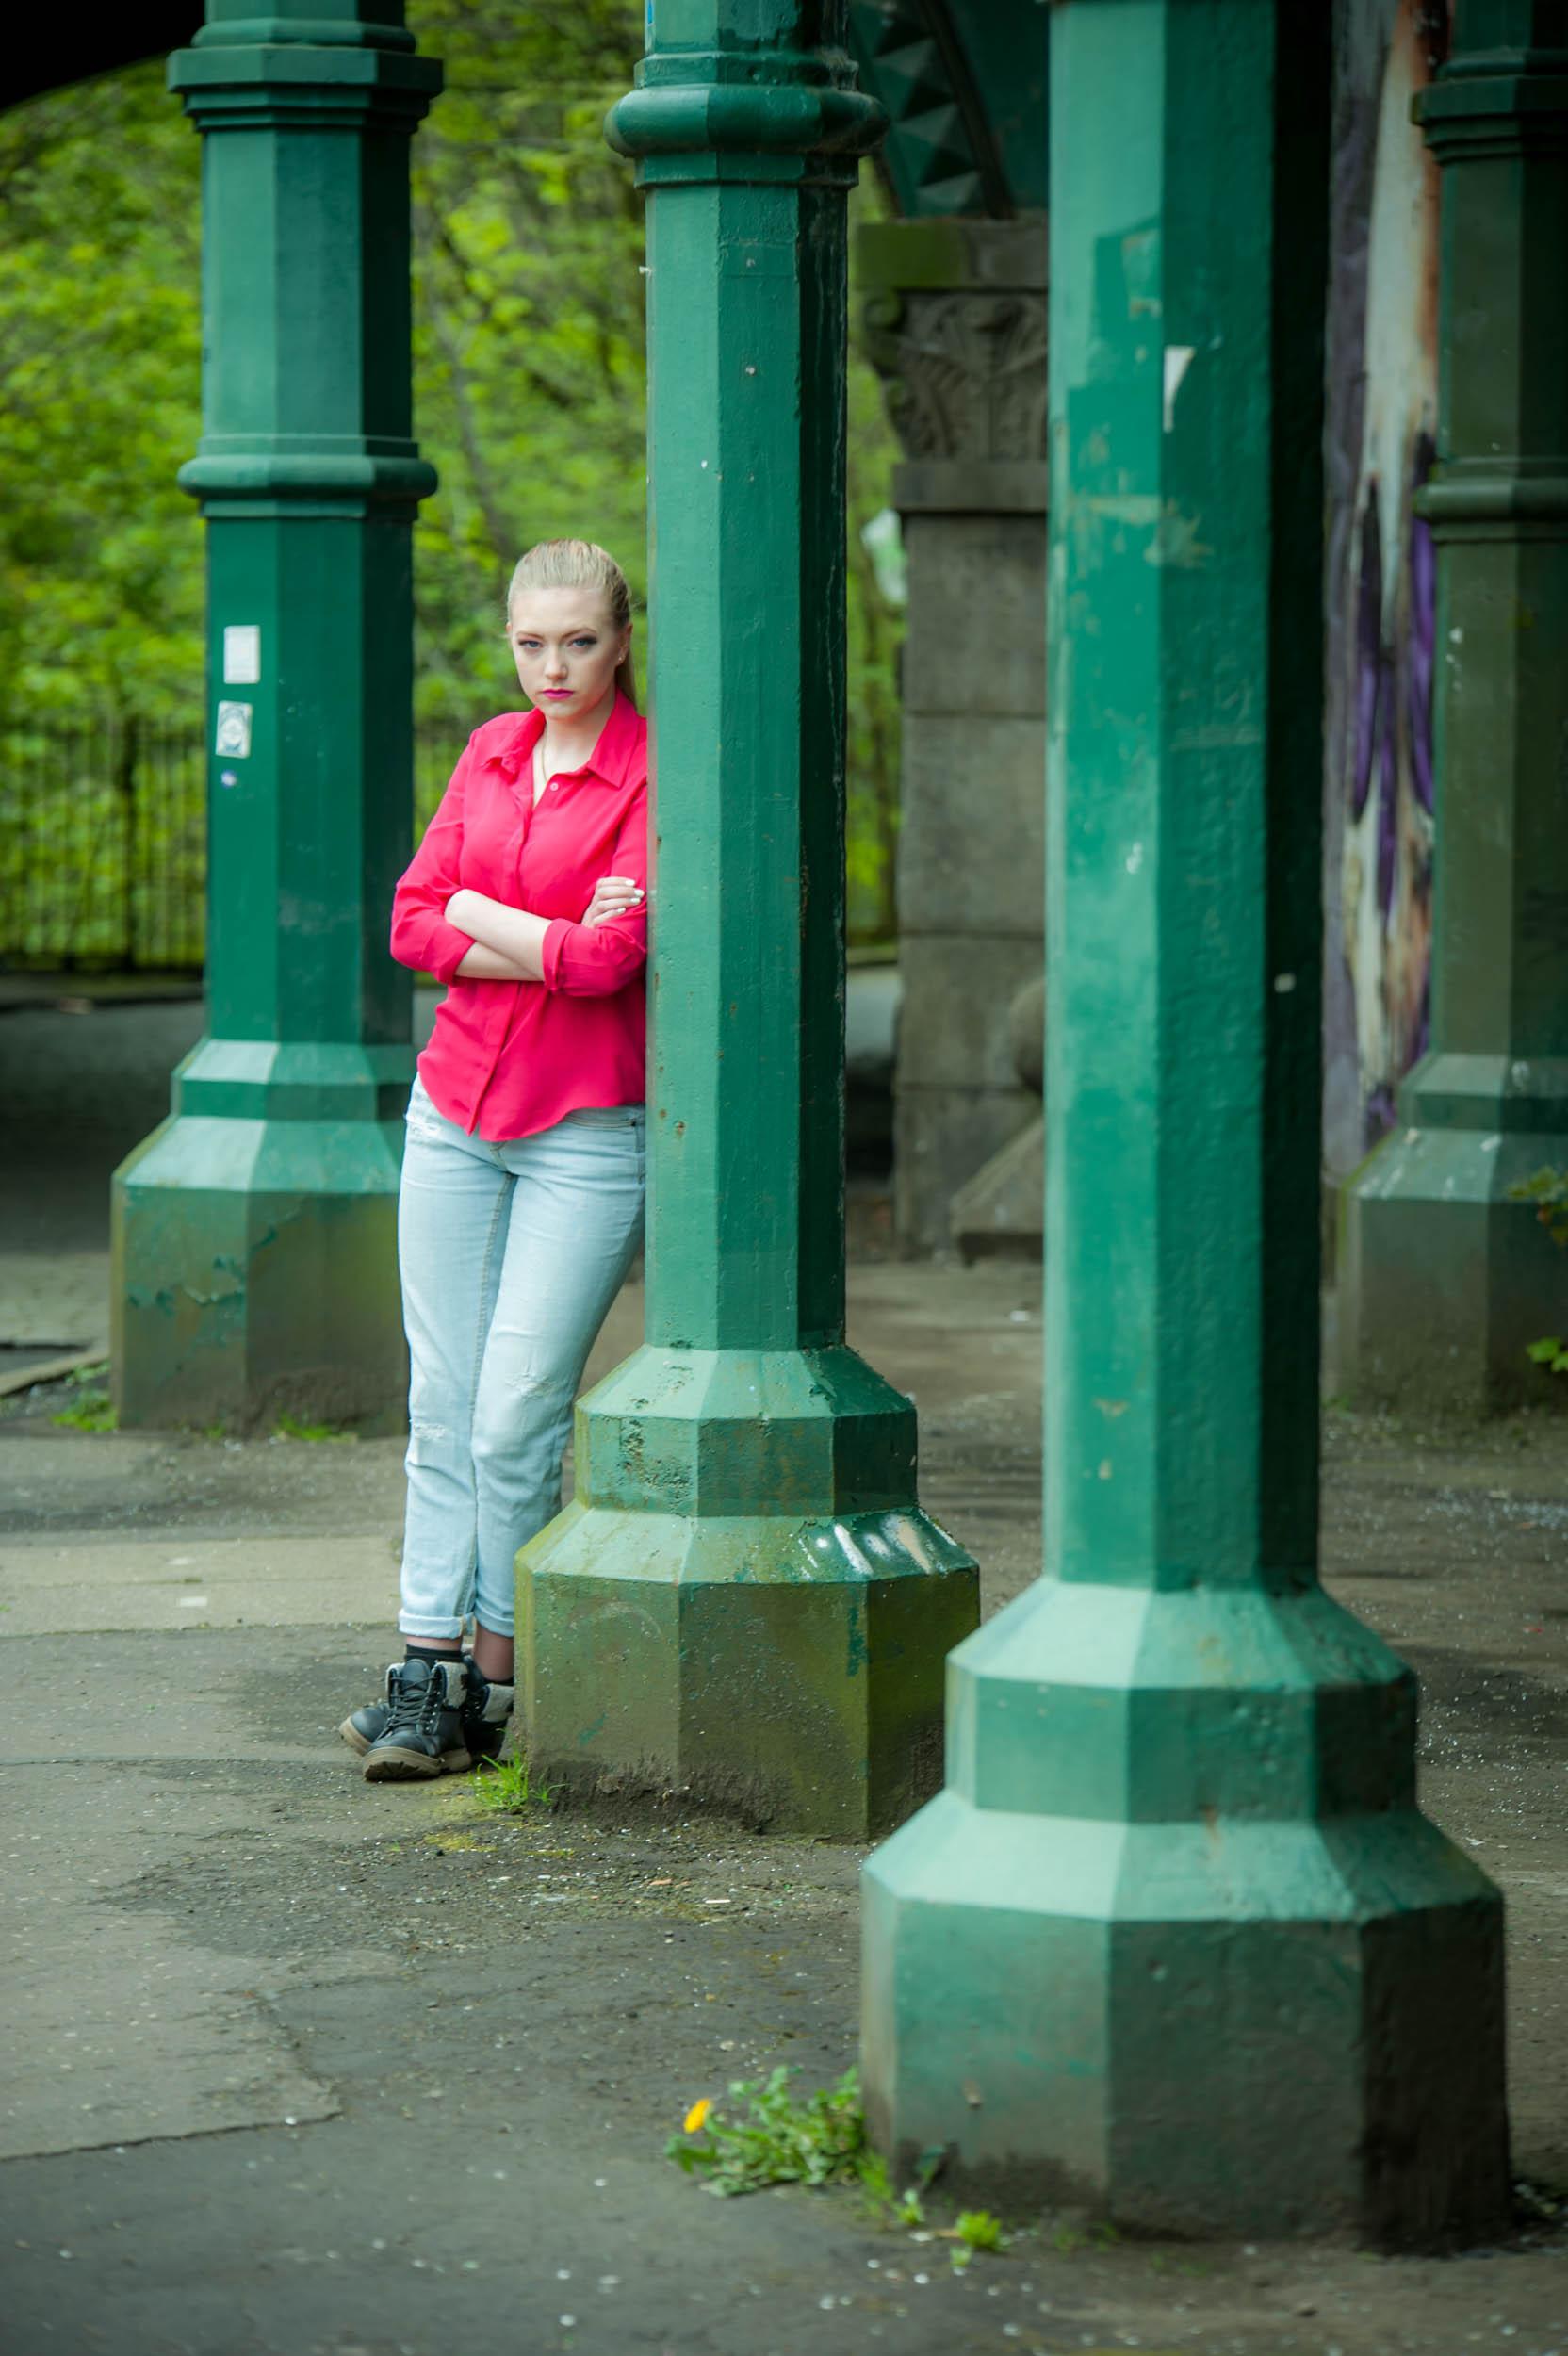 Glasgow-West-End-Portraits-Up-6682.jpg